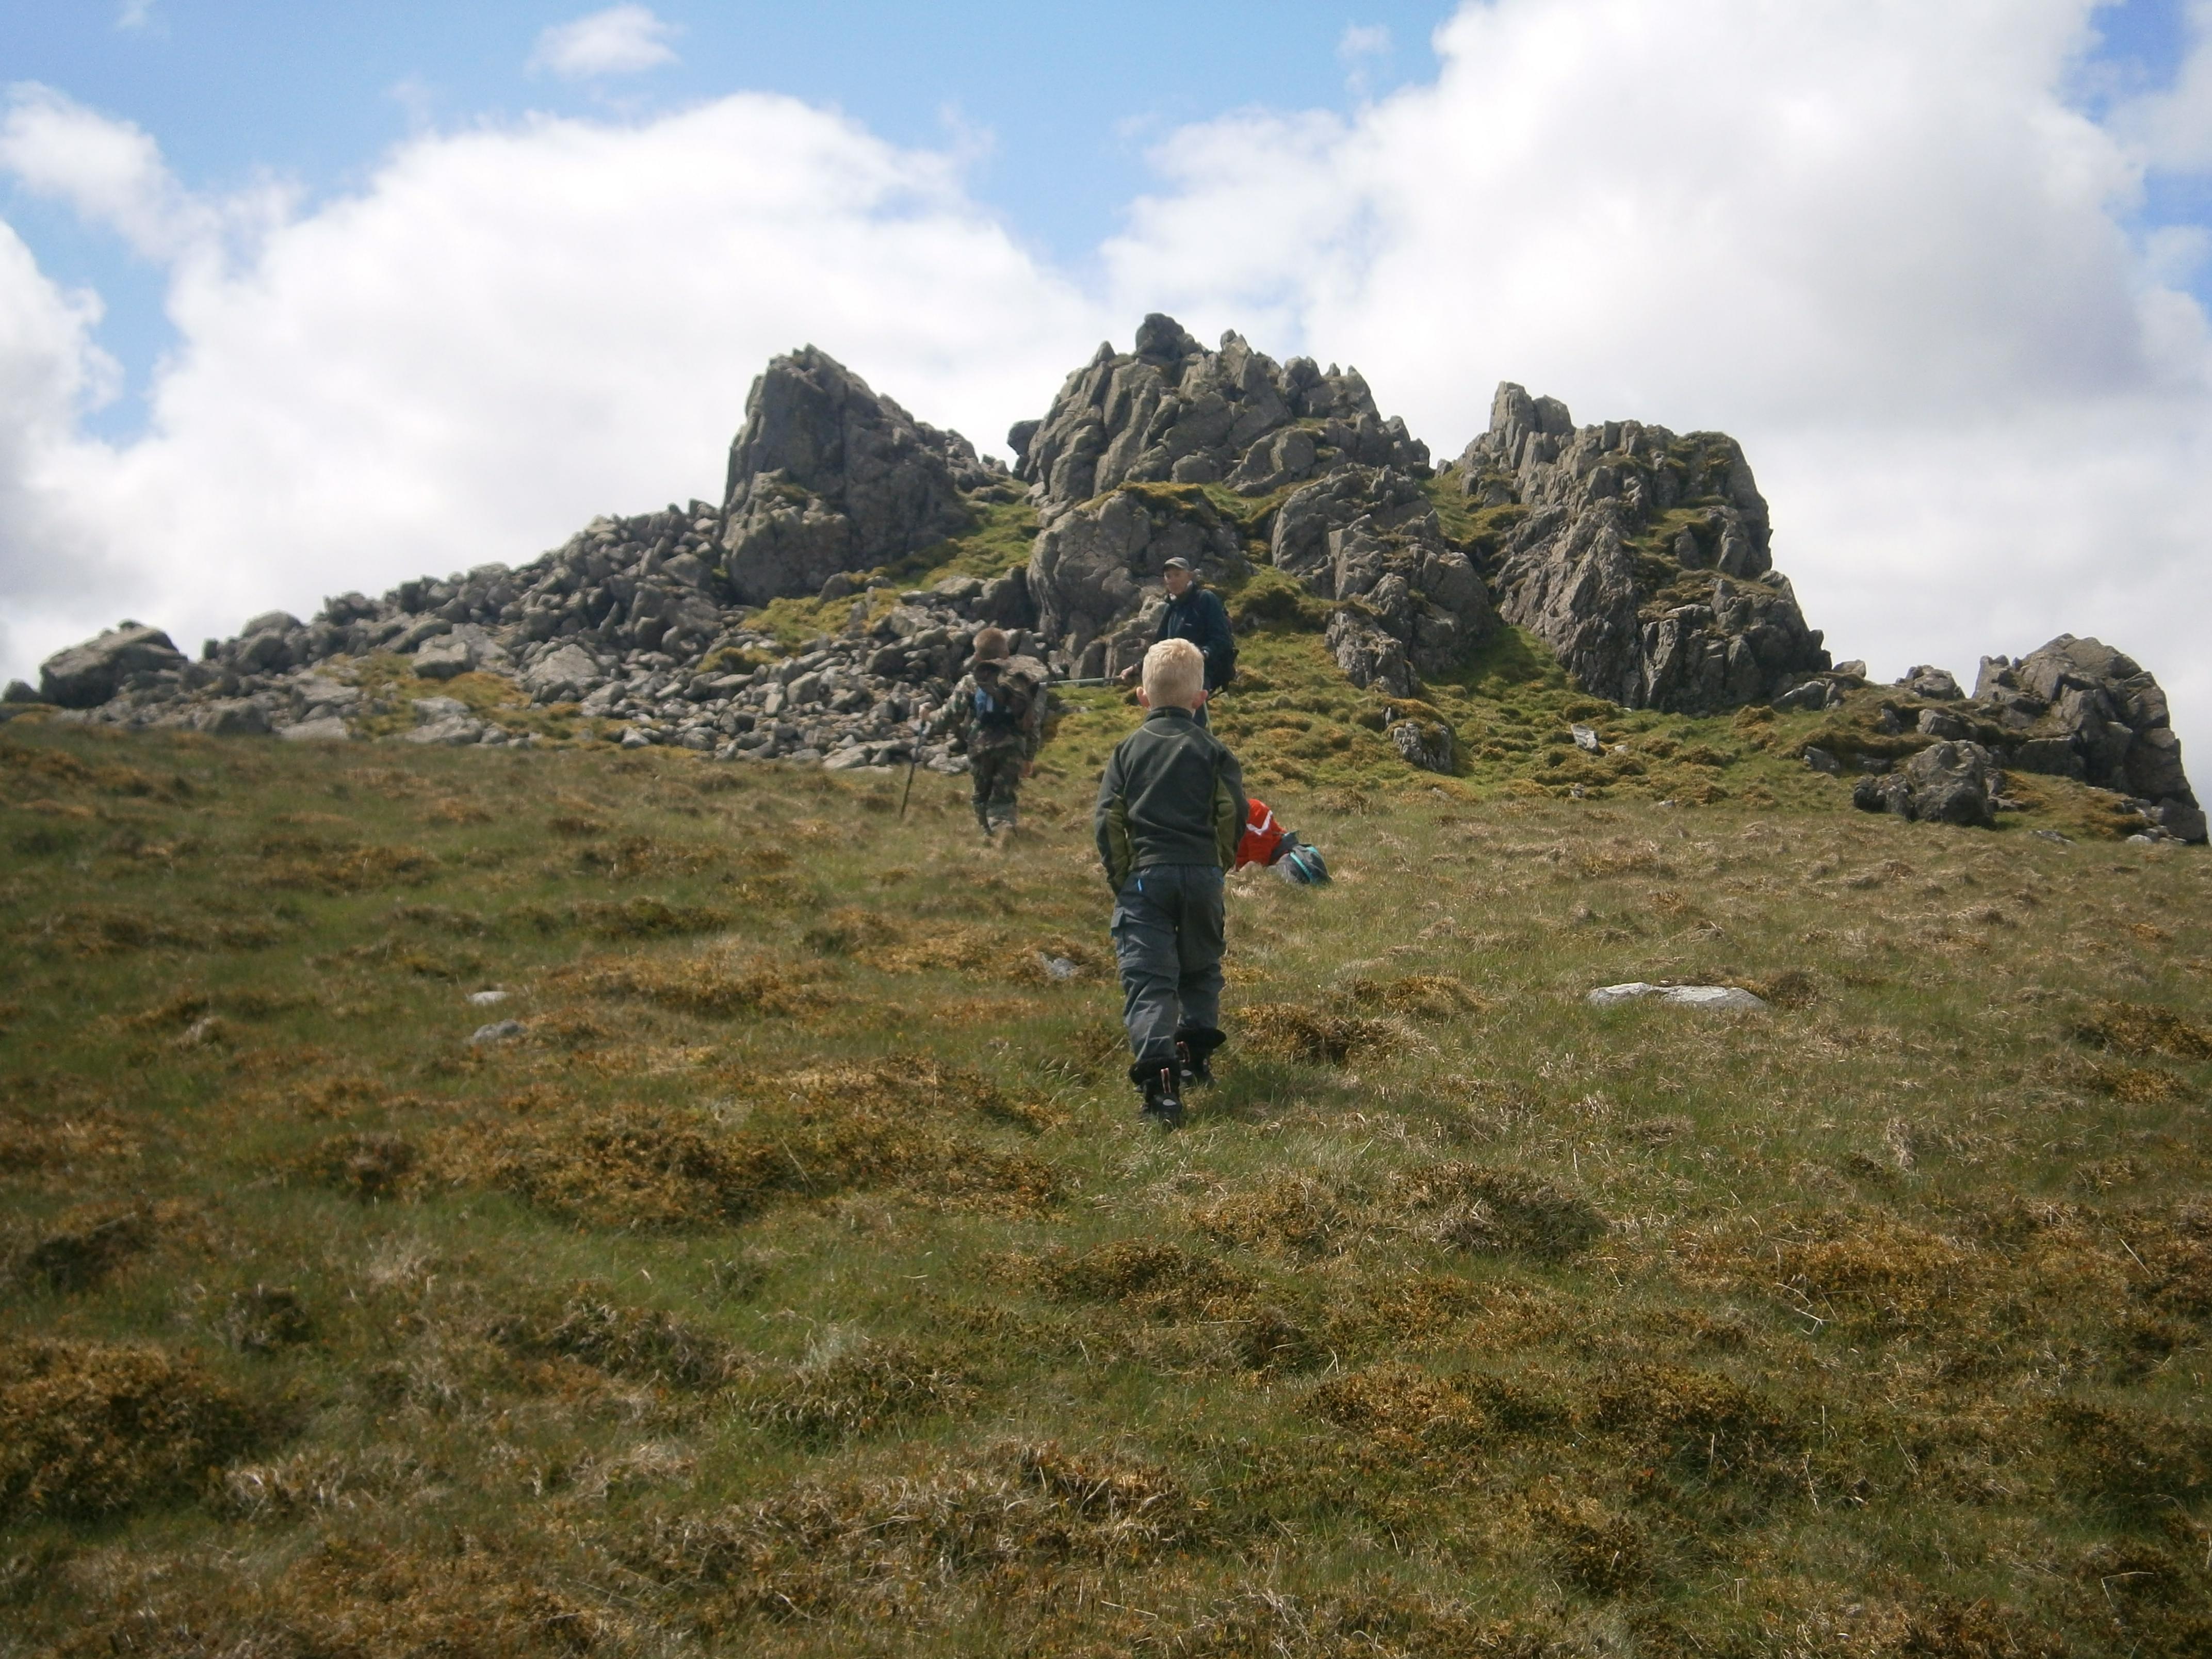 Approaching Braydon Crag